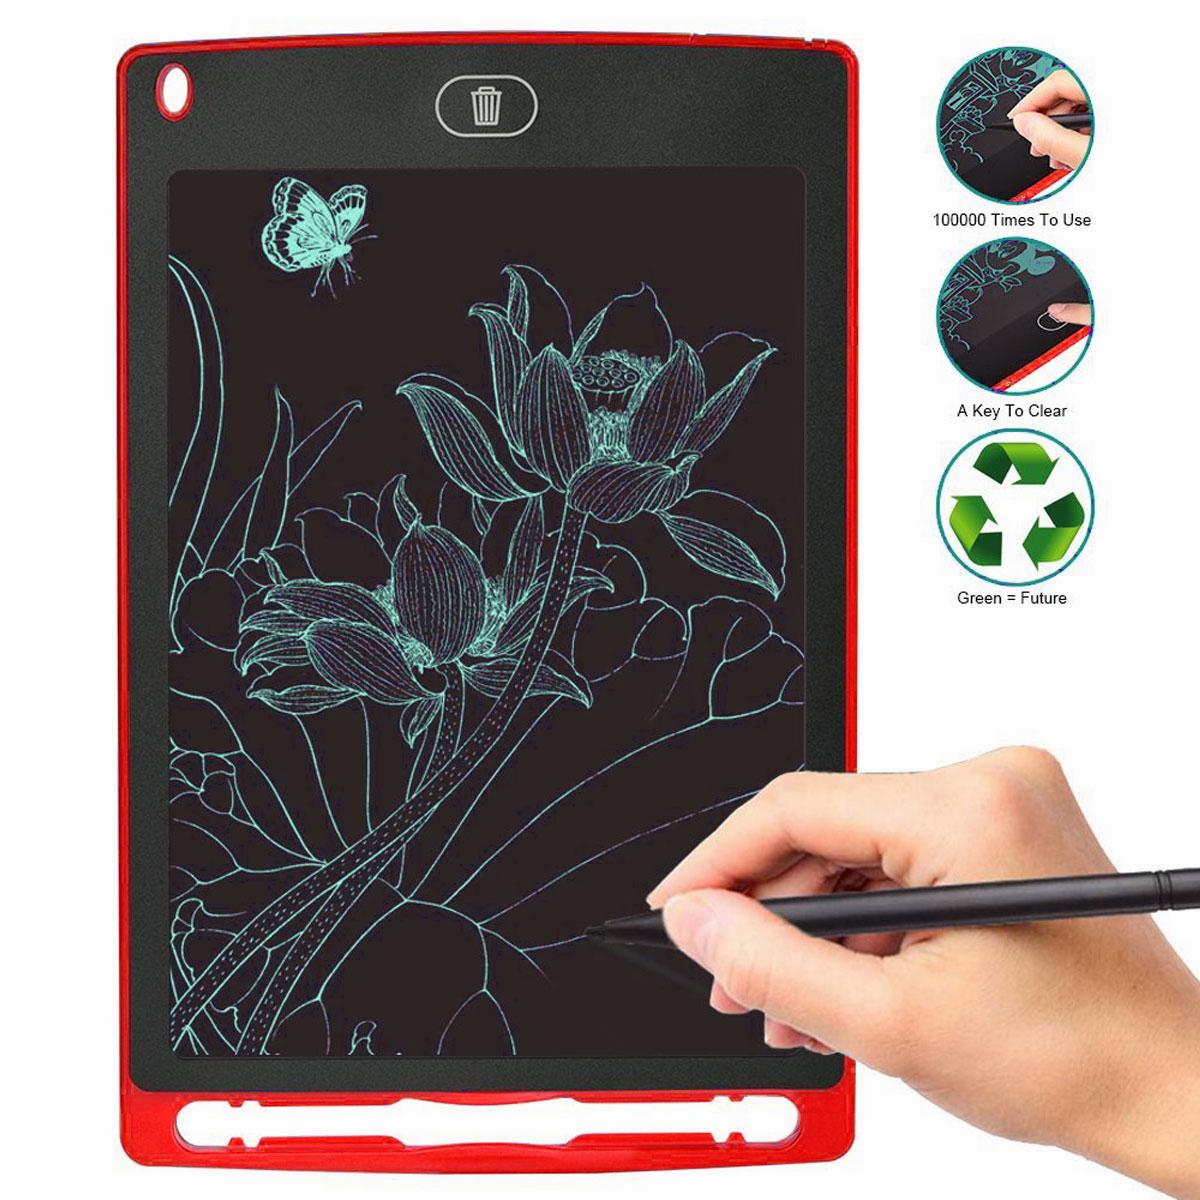 8-5-034-Digital-Electronic-LCD-Writing-Tablet-Drawing-Pad-eWriter-Board-For-Kids thumbnail 35